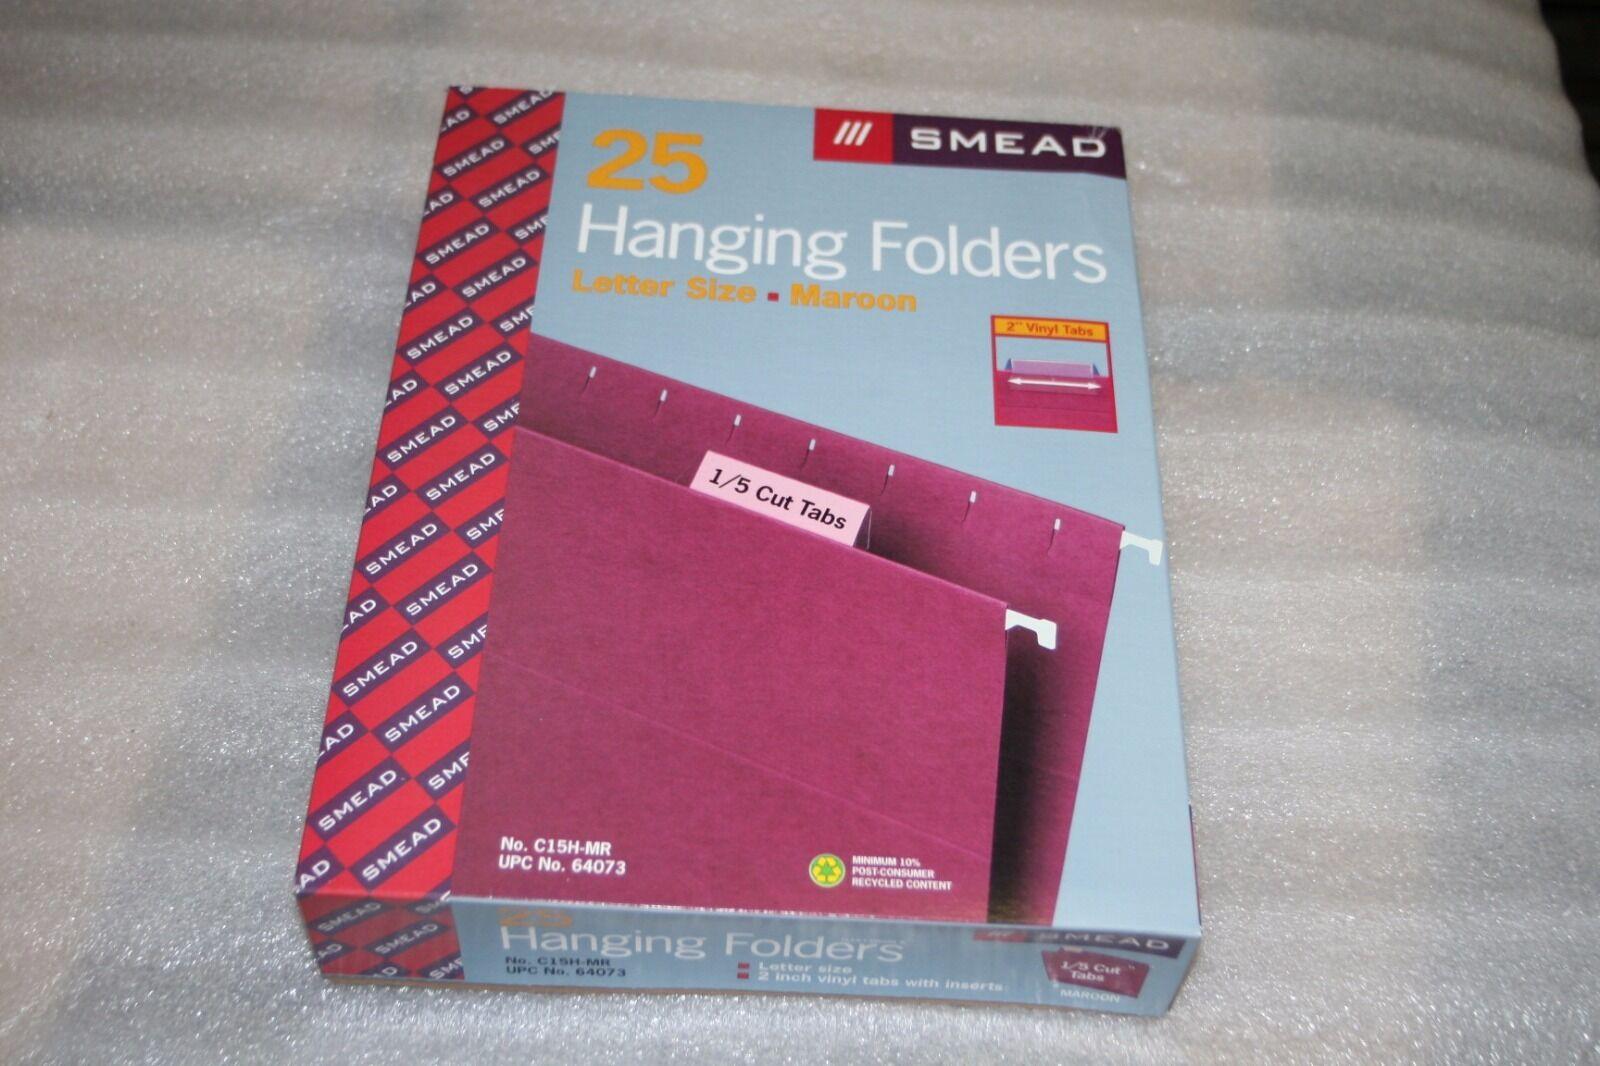 Smead hanging file folders 1 5 cut tab, letter size, Case of 250, Maroon